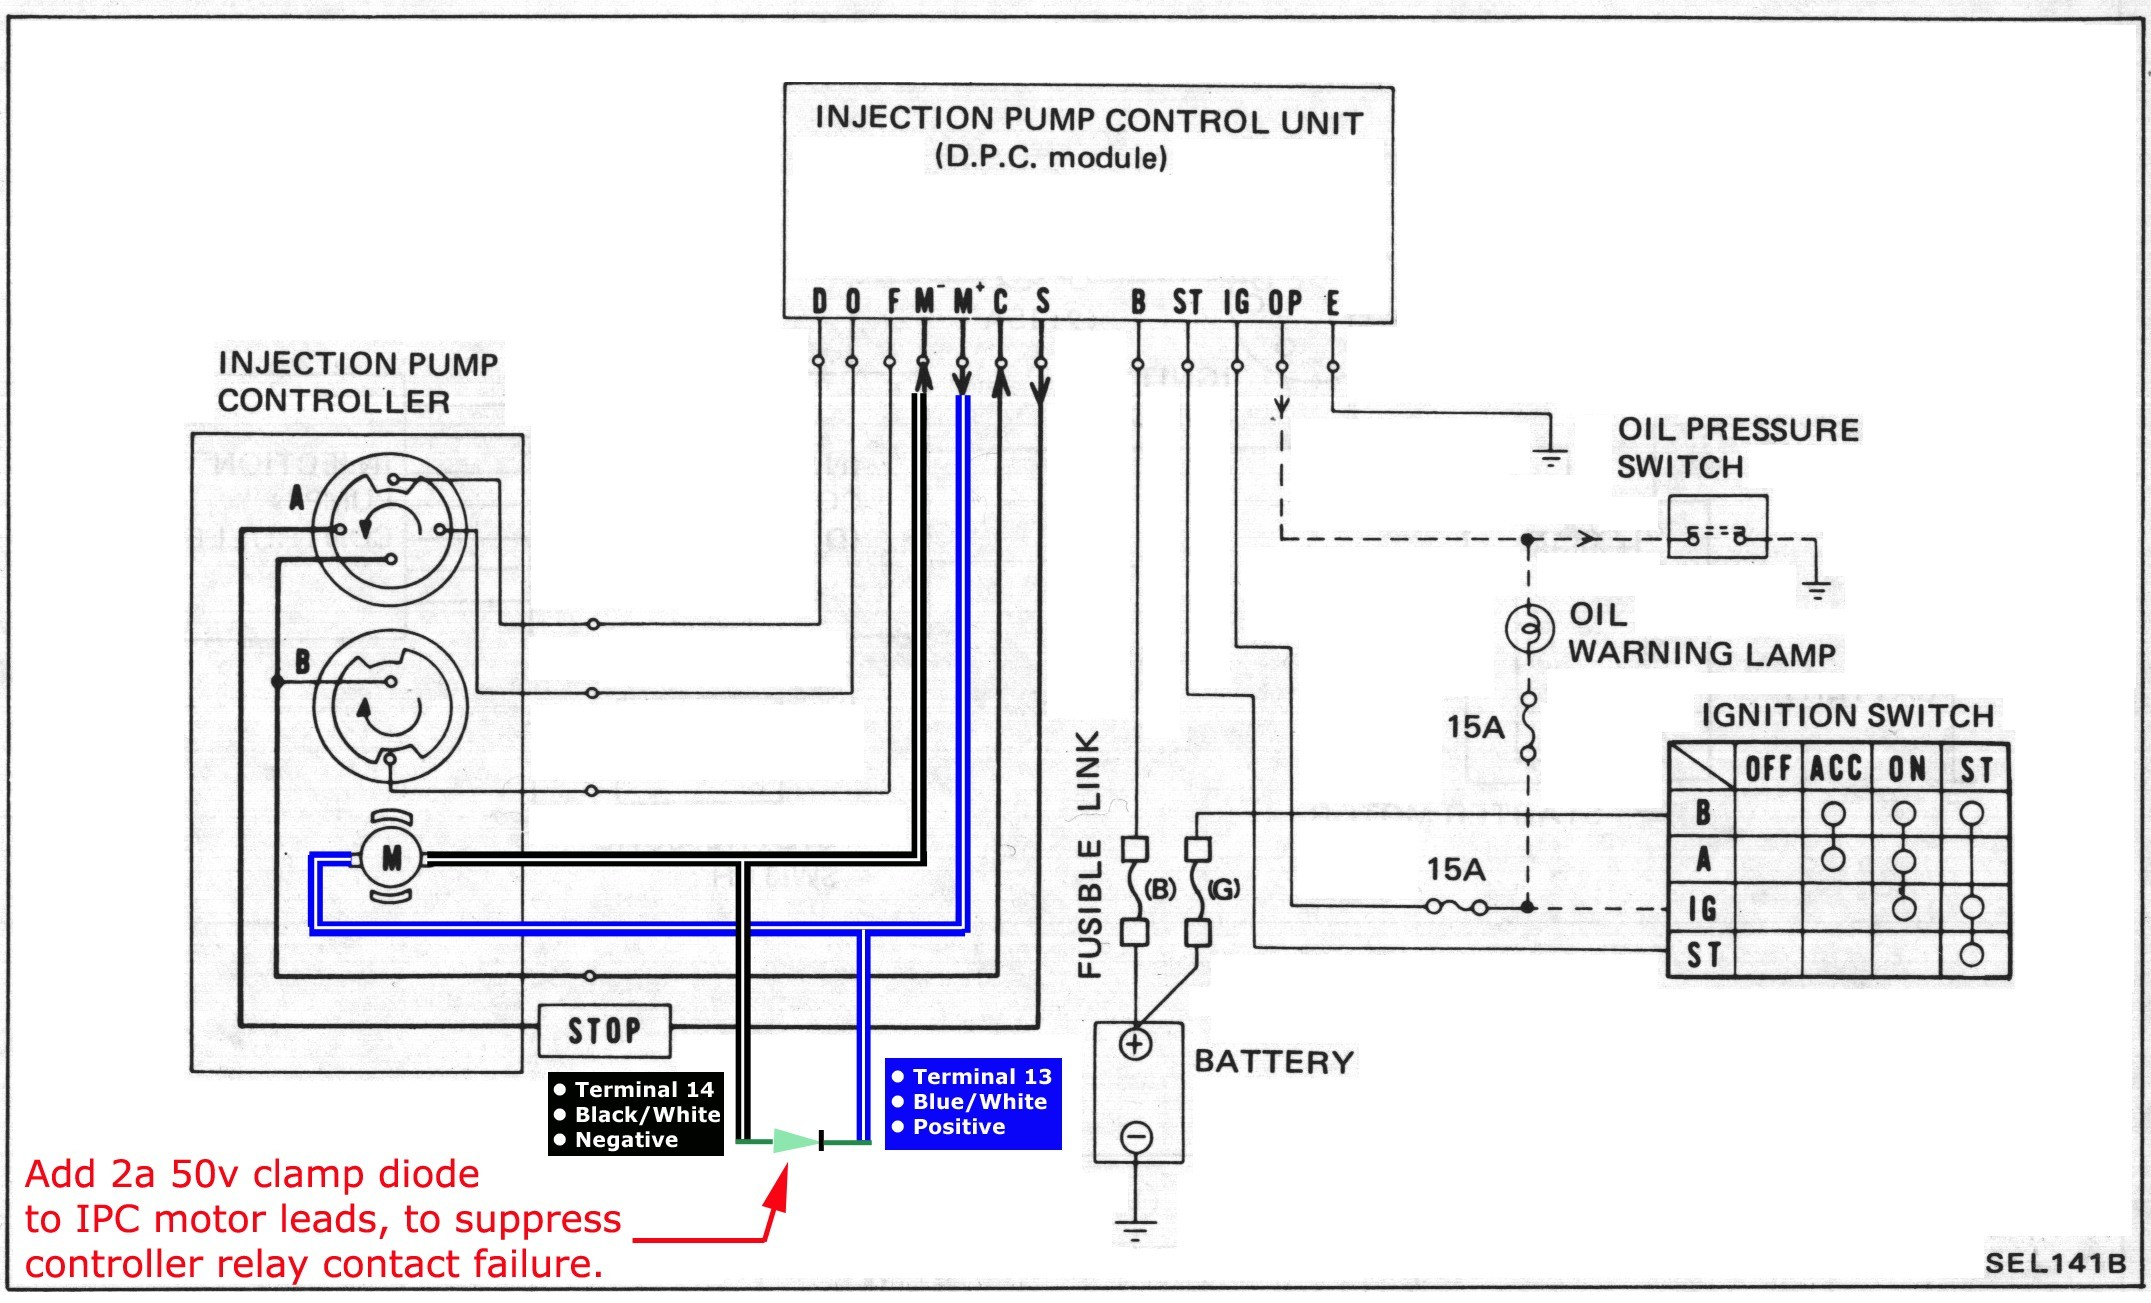 2006 Nissan Frontier Engine Diagram Nissan Maxima Engine Diagram Moreover Nissan Altima Engine Diagram Of 2006 Nissan Frontier Engine Diagram